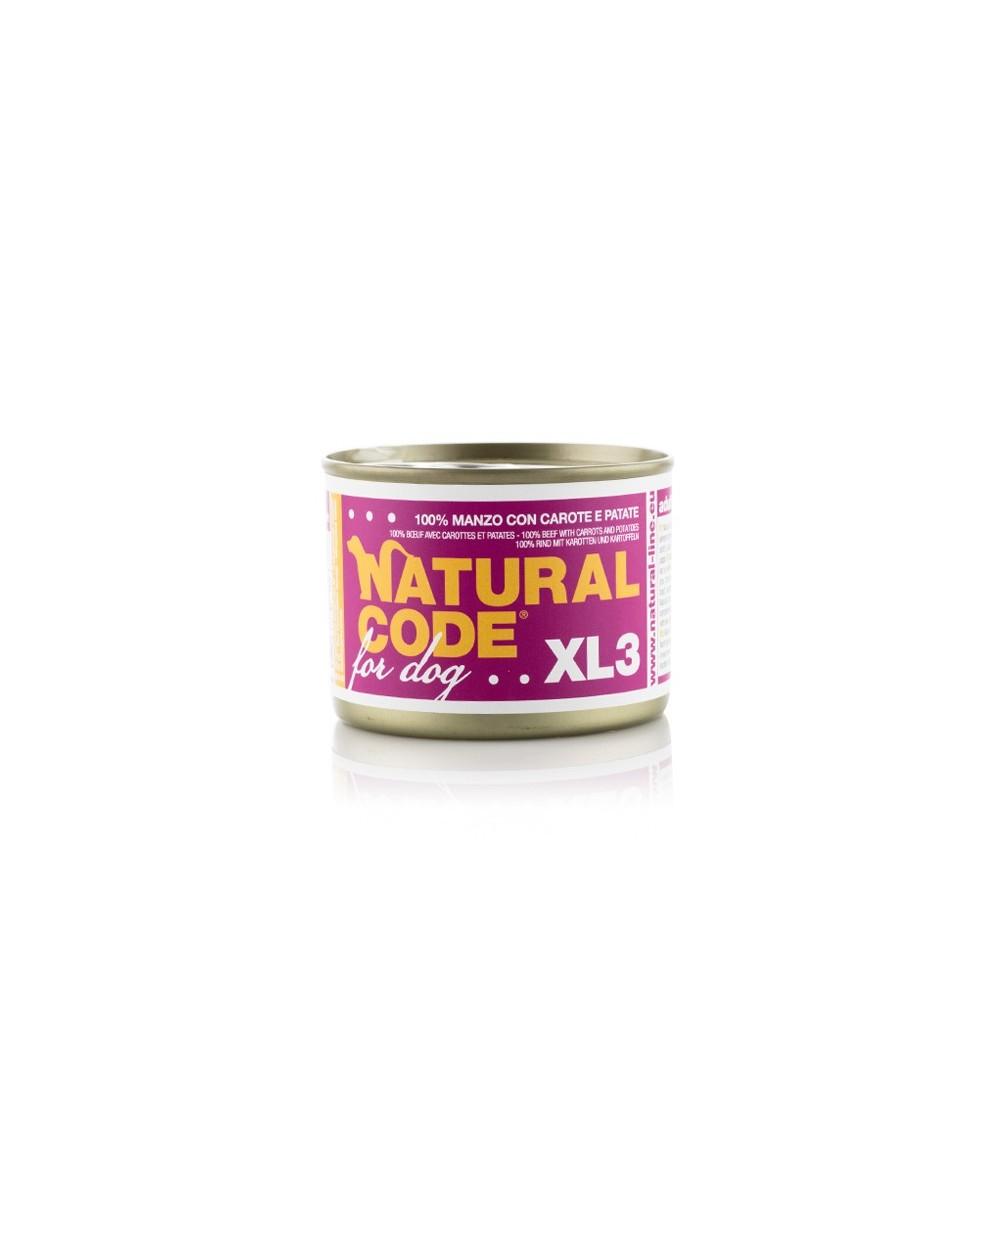 Natural Code Cane XL 185g 03 Manzo con Carote e Patate